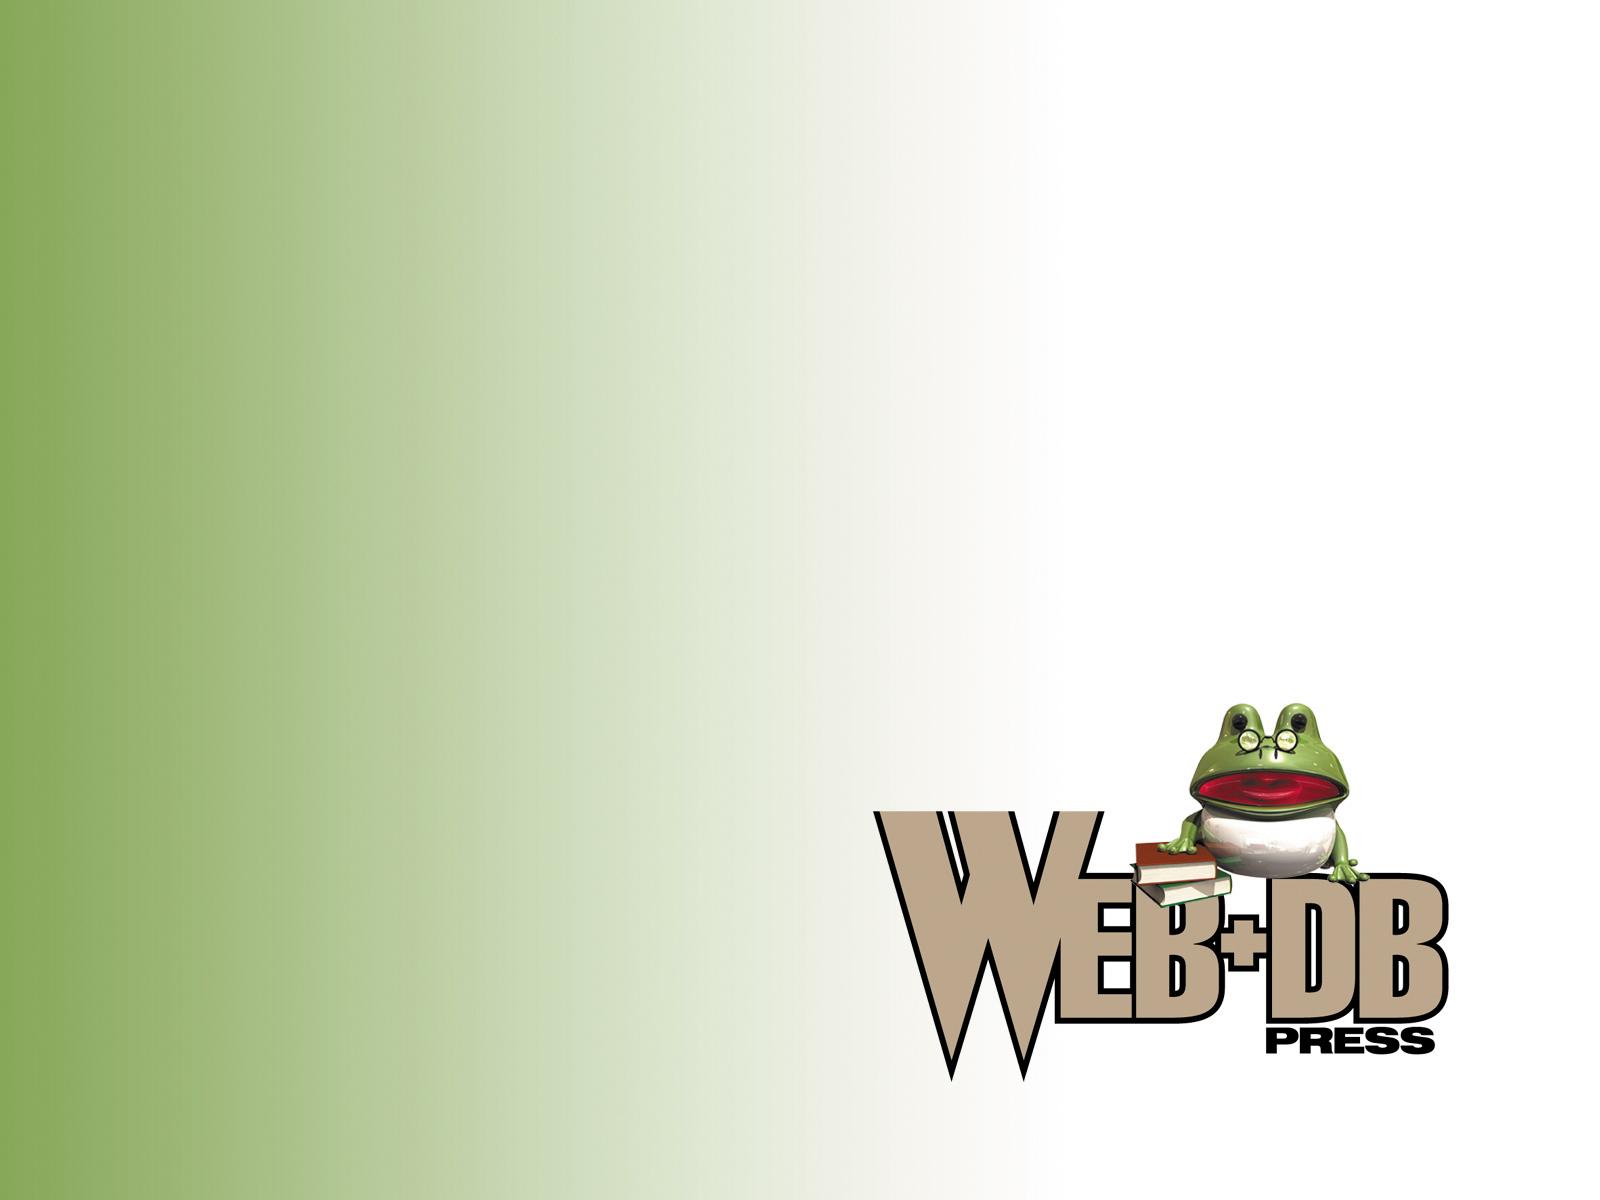 Web Db Press Vol 41 表紙イラスト 壁紙ダウンロード 本誌からの